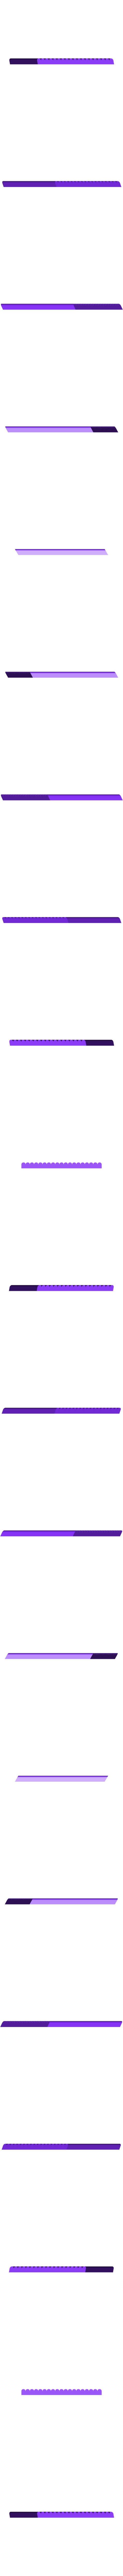 2018 TEJADO 02.stl Download STL file Townhouse Escala (N) • 3D print model, 3DAKSER